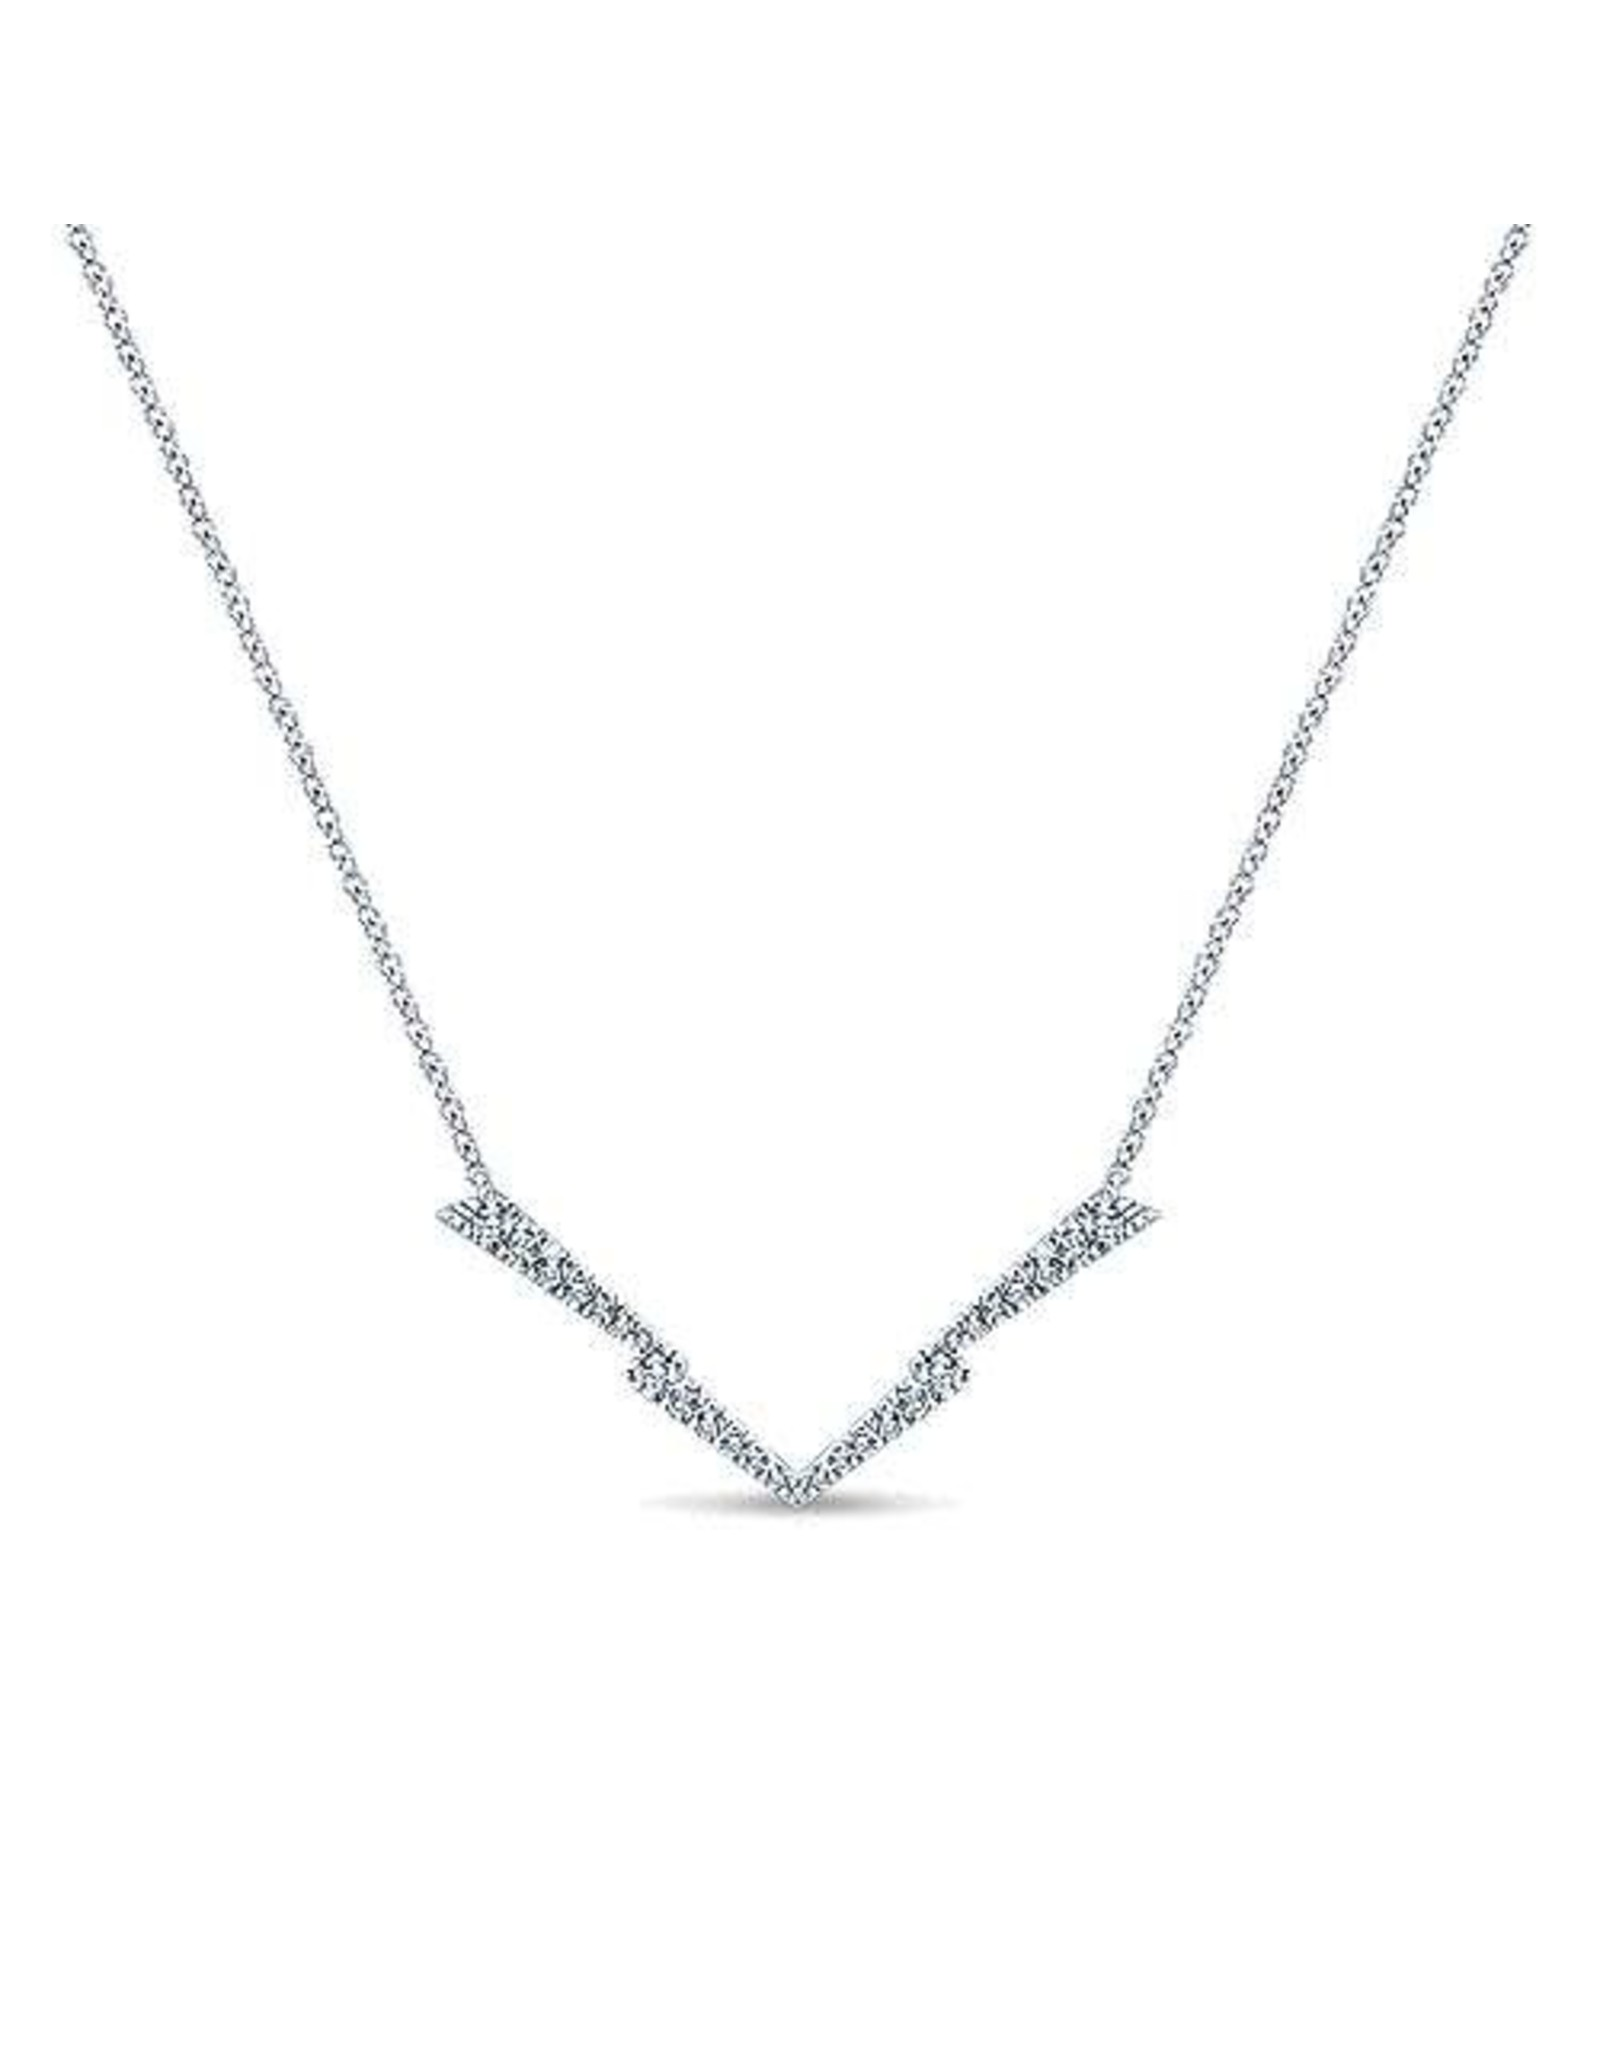 14K White Gold Diamond V Necklace, D: 0.29ct